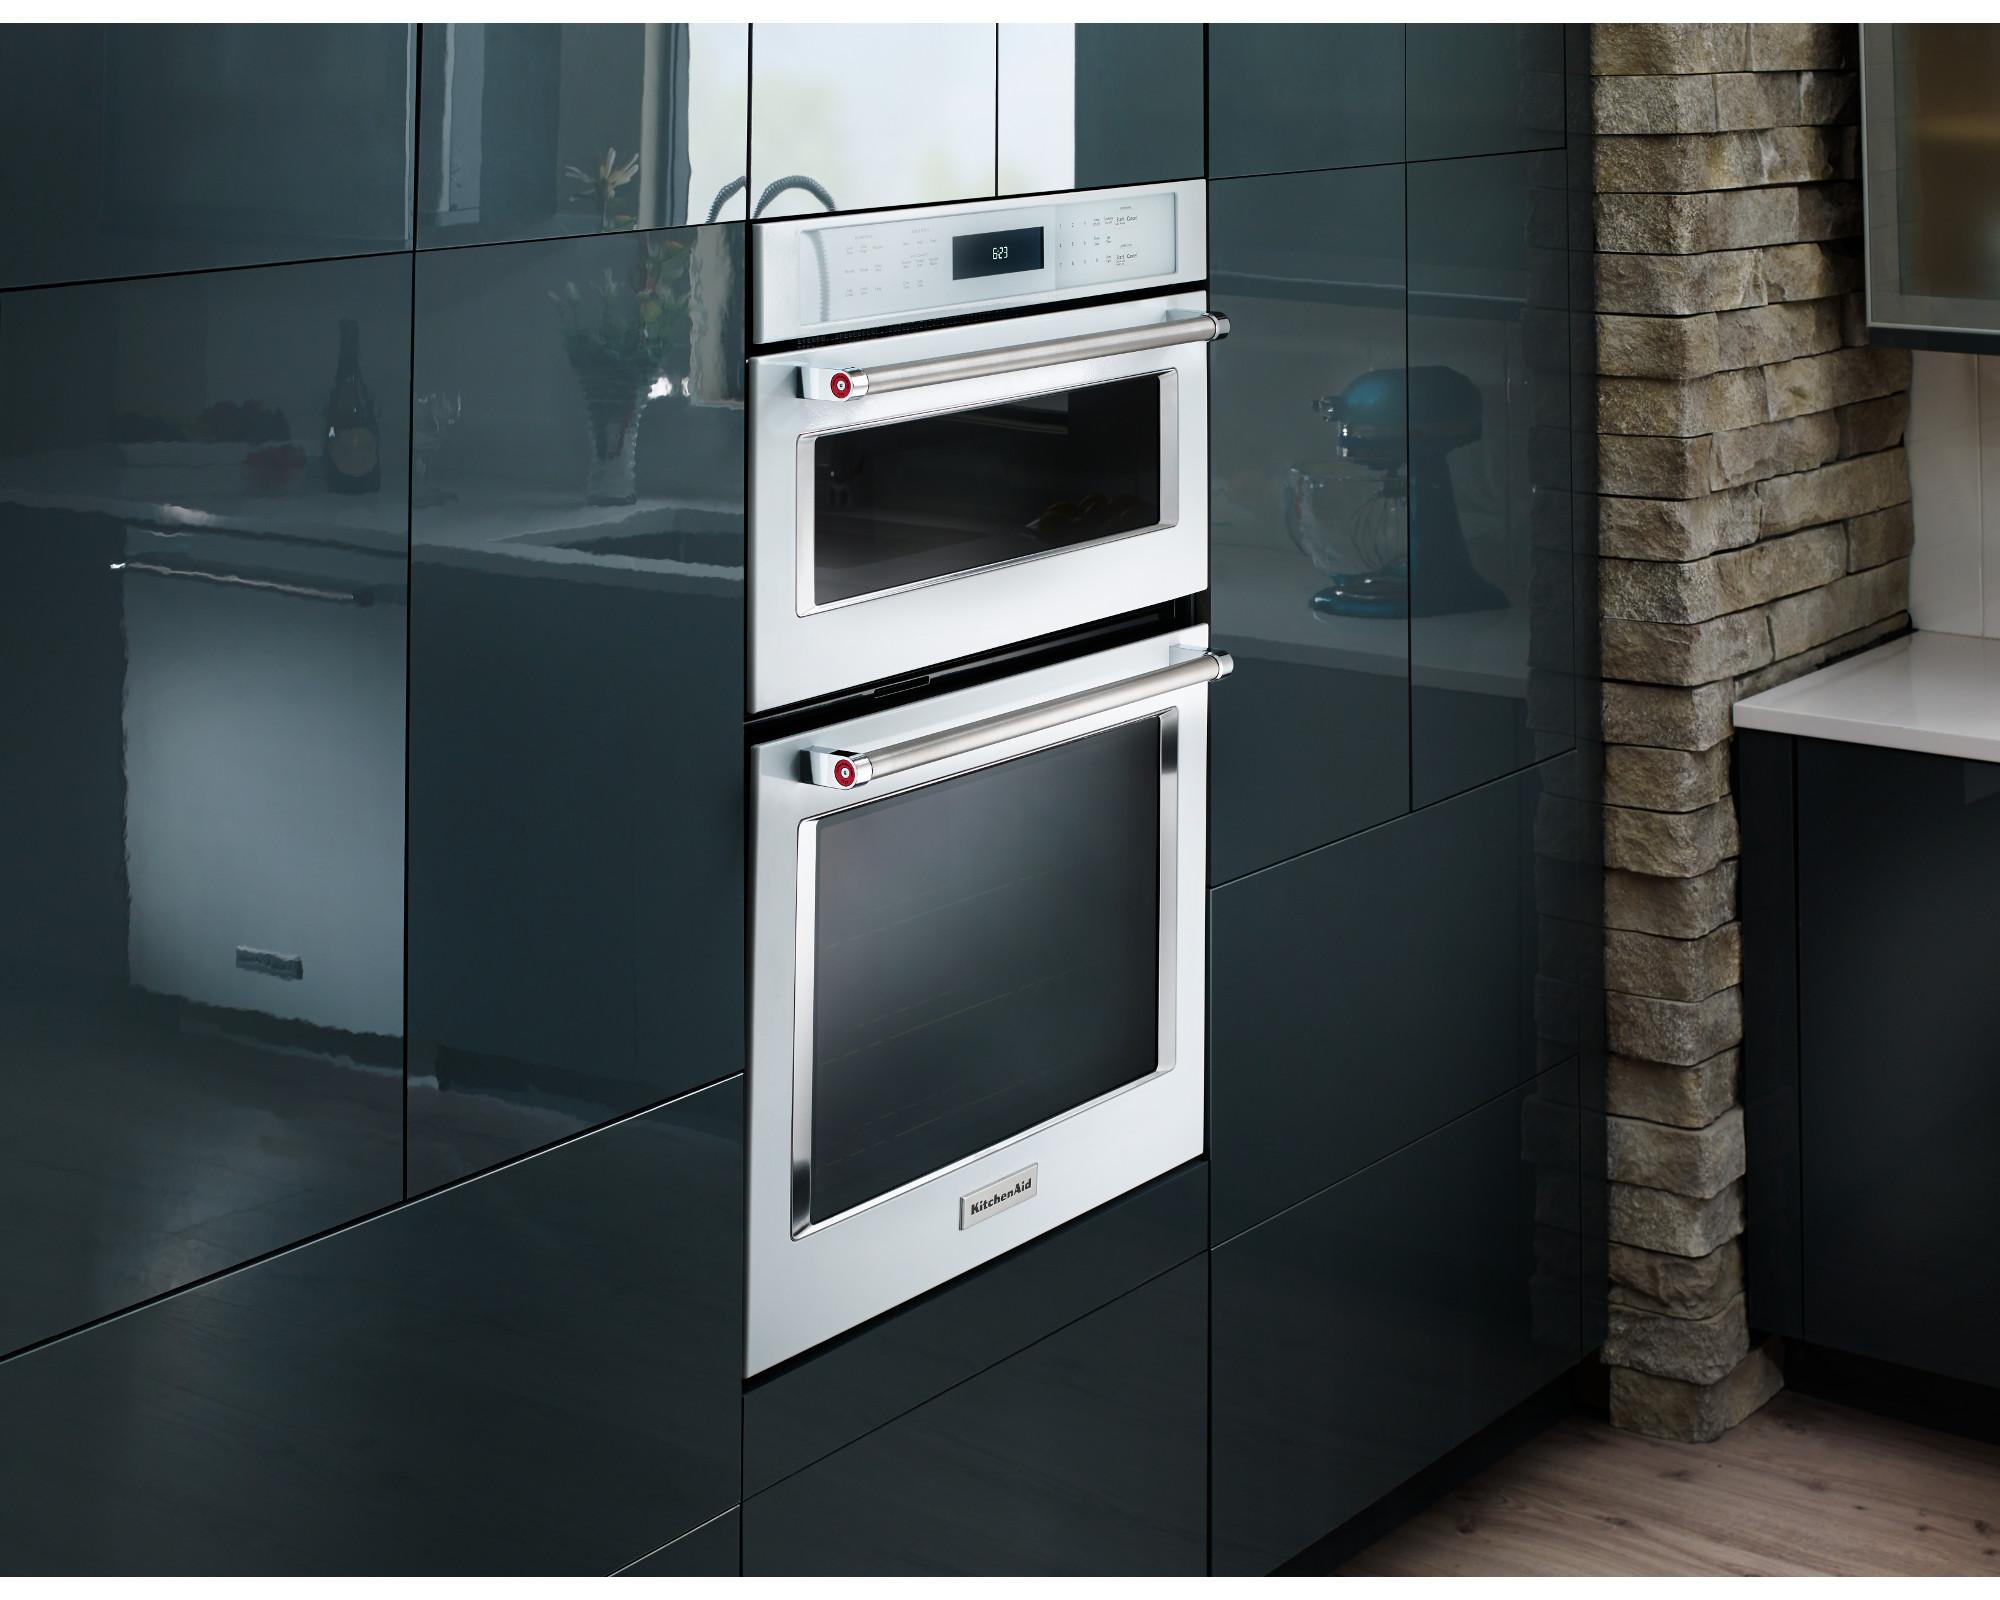 kitchen aid wall oven cool stuff kitchenaid koce500ewh 30 combination w even heat true convection white